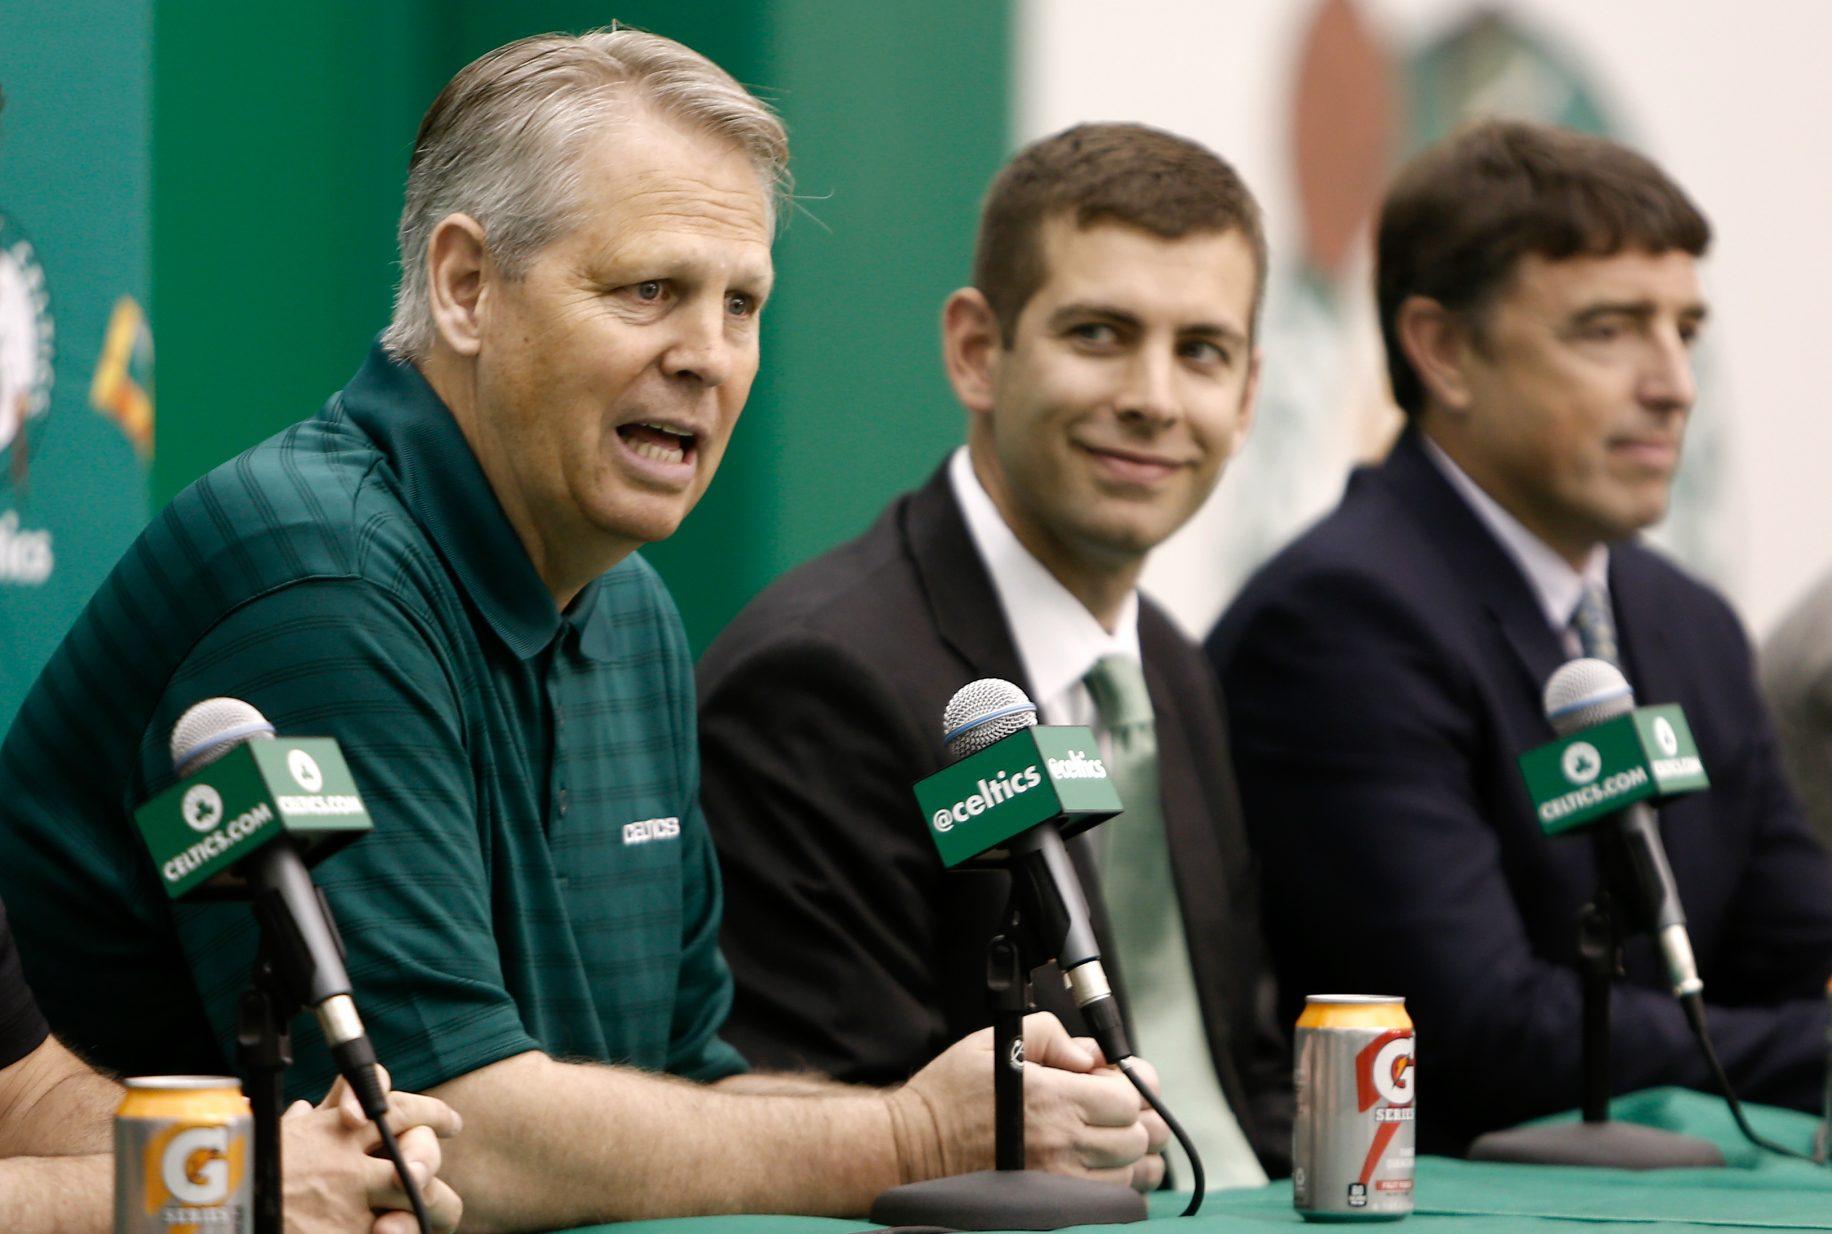 If Danny Ainge Doesn't Cast Aside His Passivity, the Celtics Won't Catch the Cavs 3